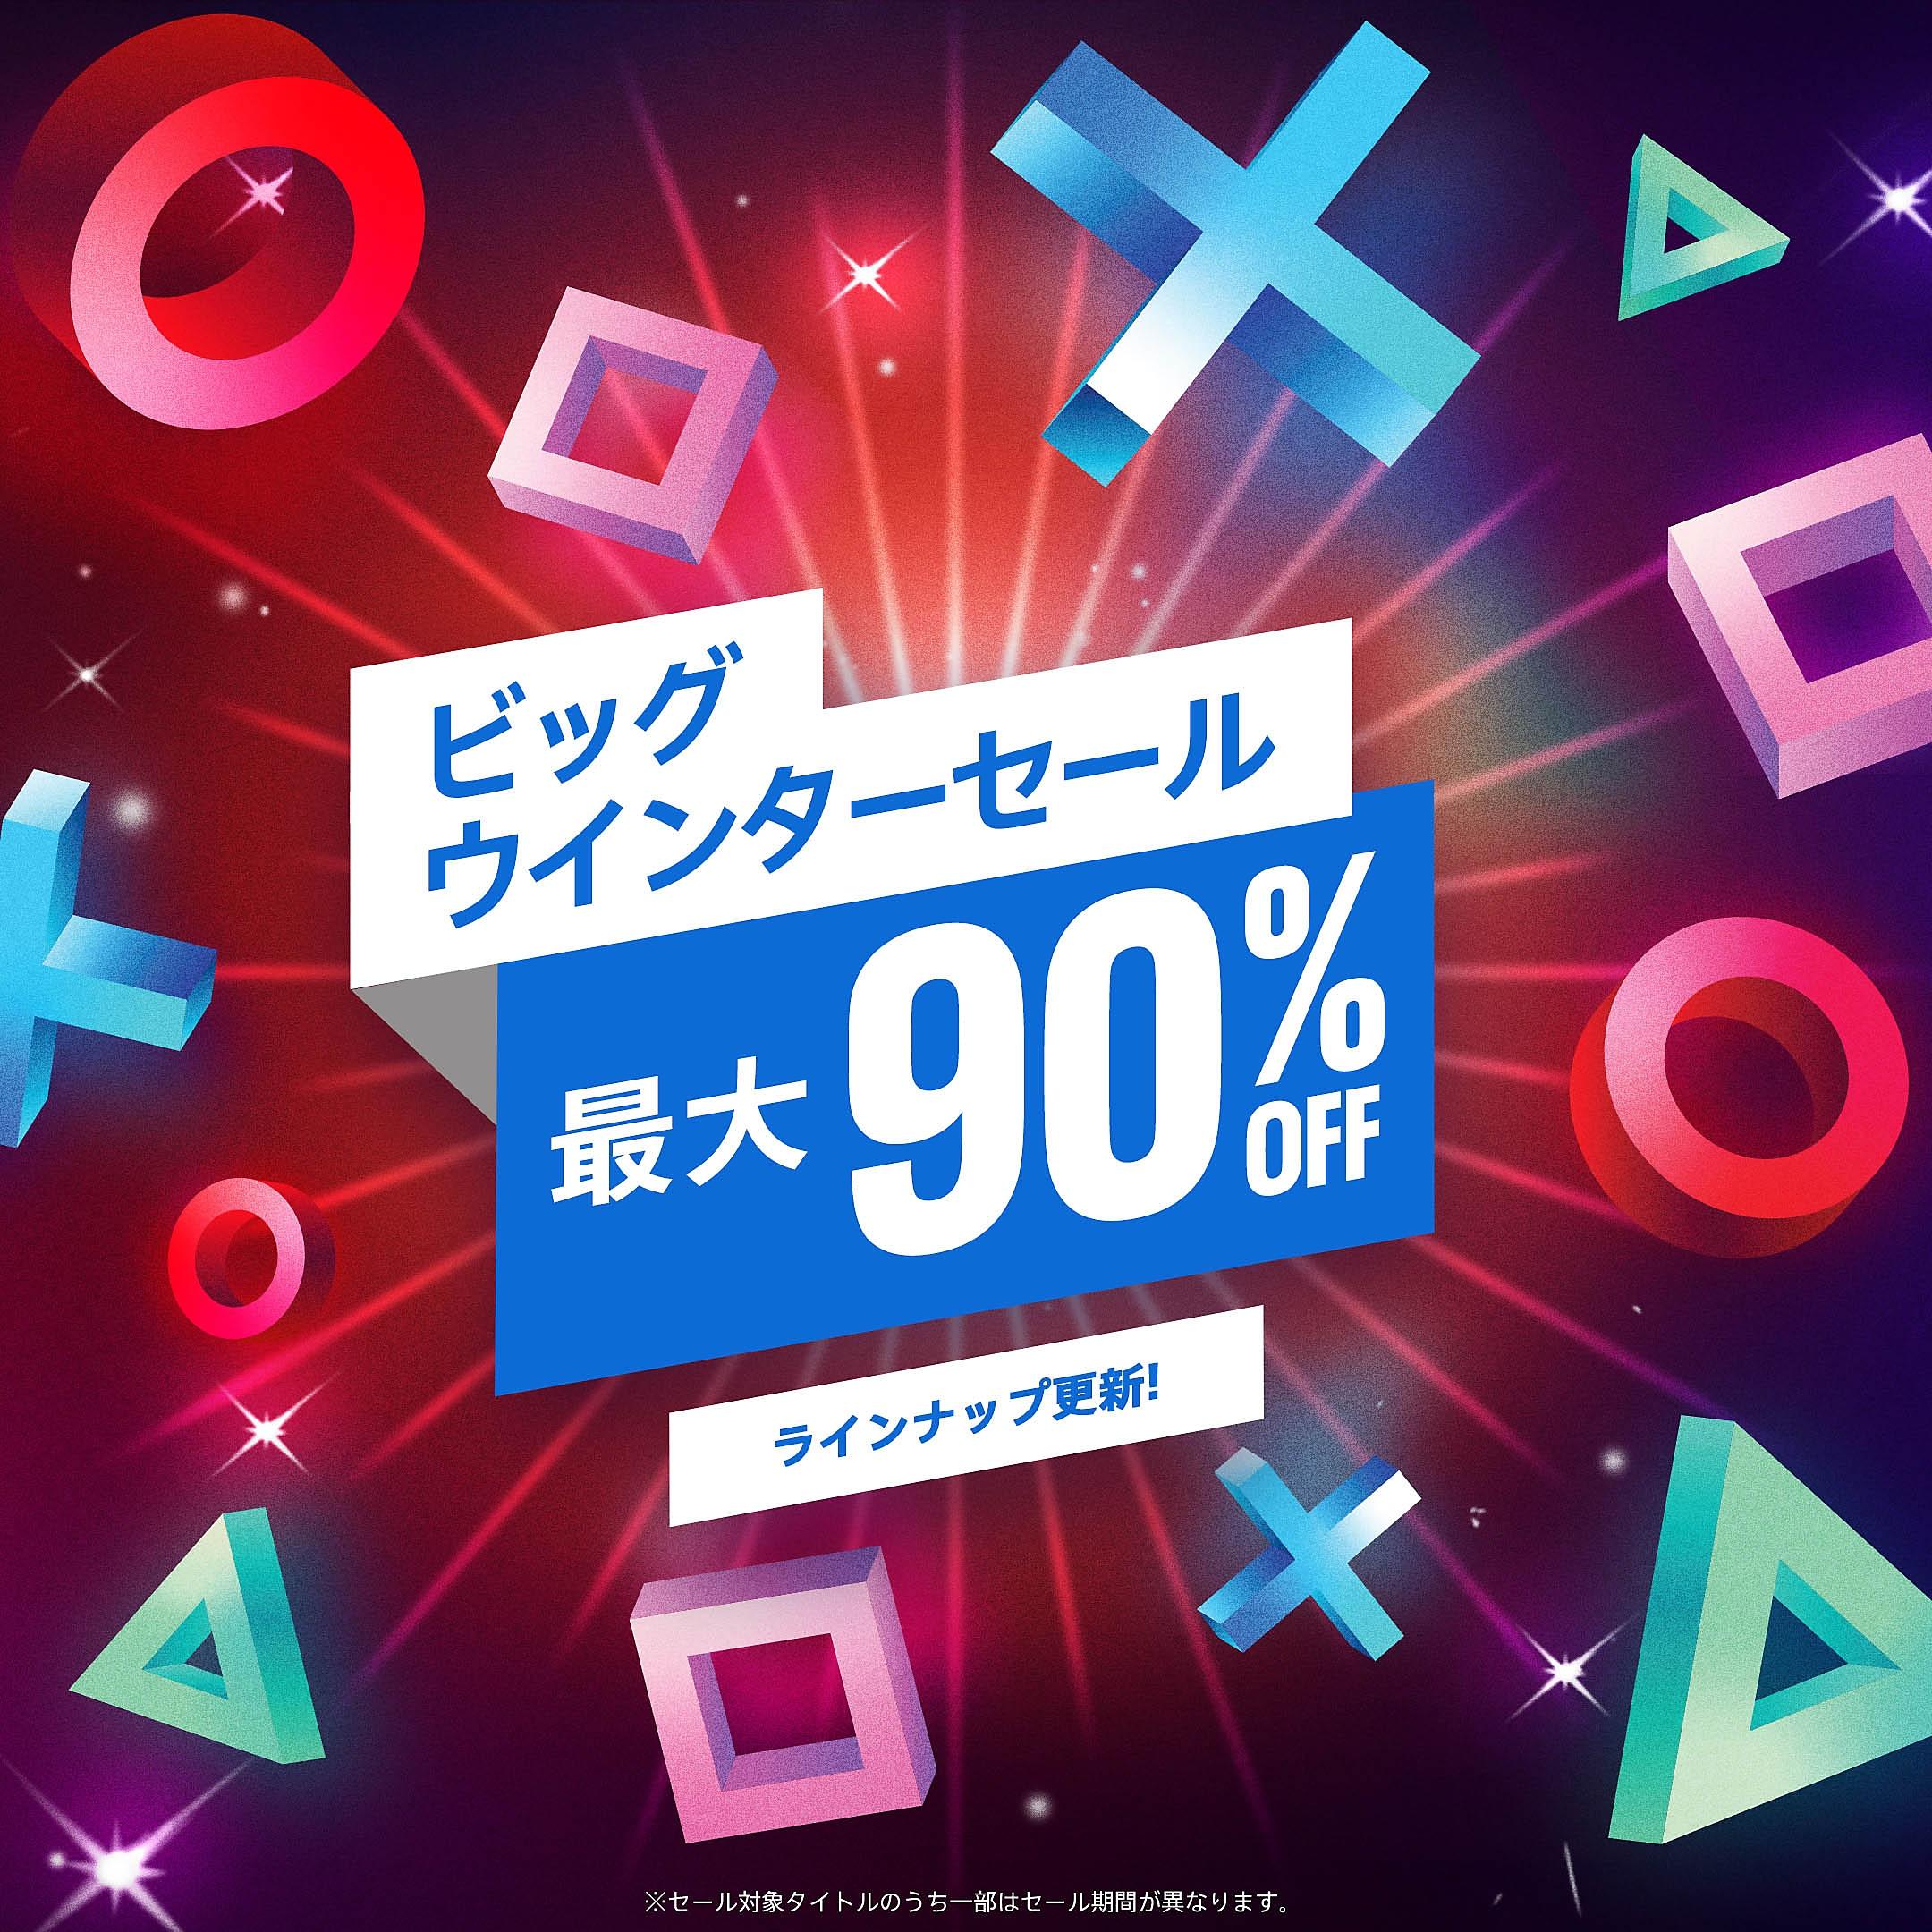 PlayStation Store - ビッグウインターセール - 最大90%OFF